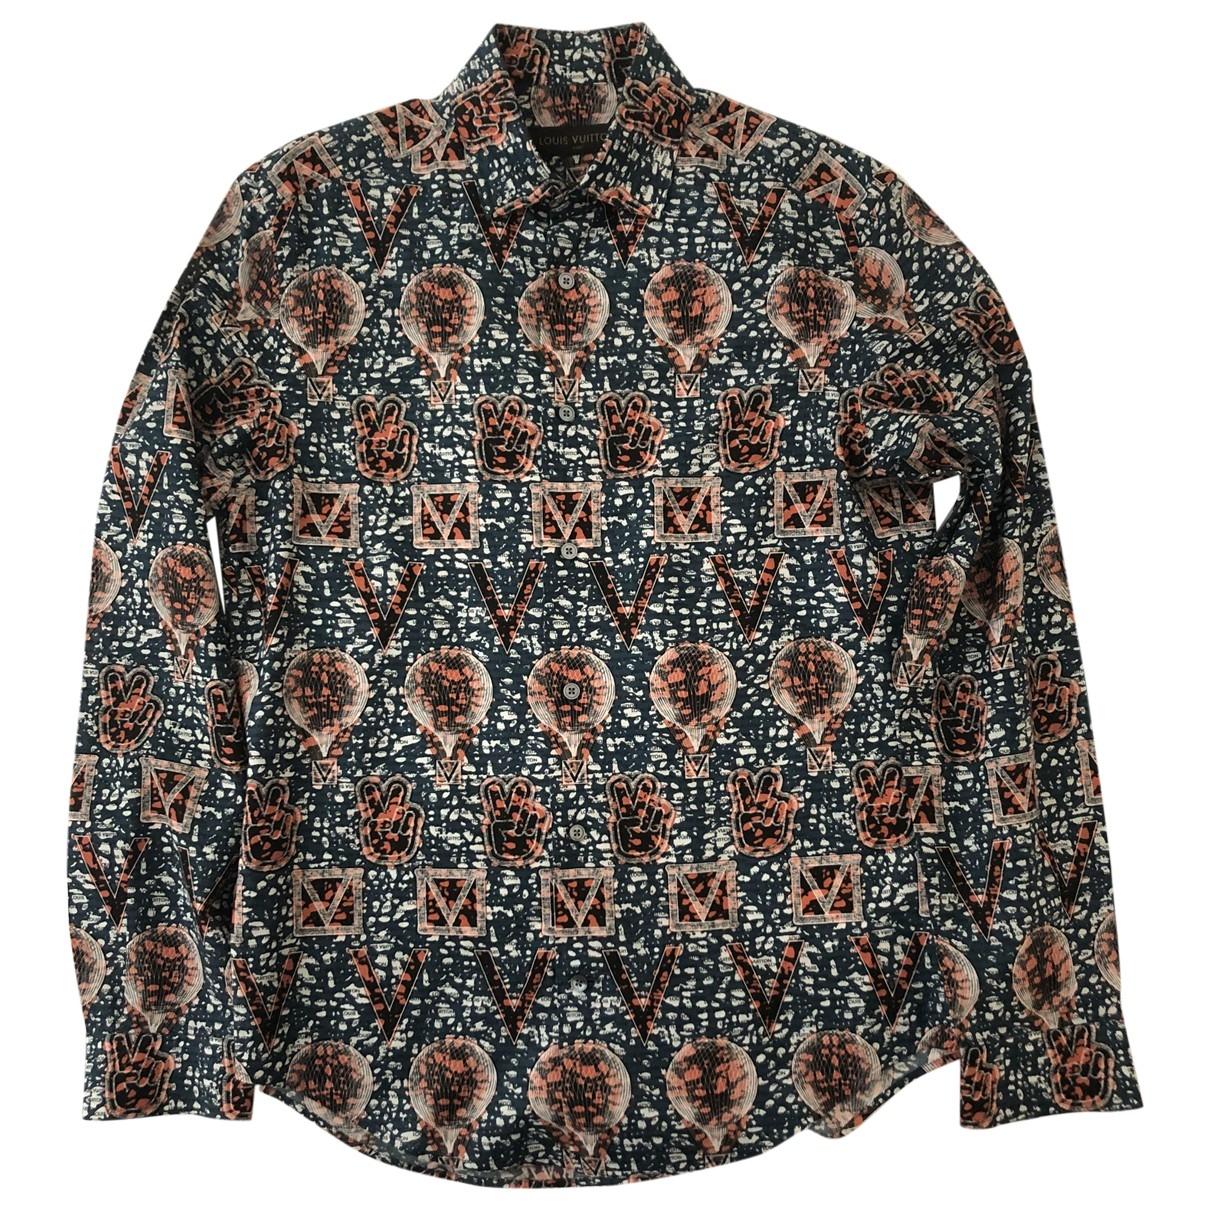 Camisas Louis Vuitton